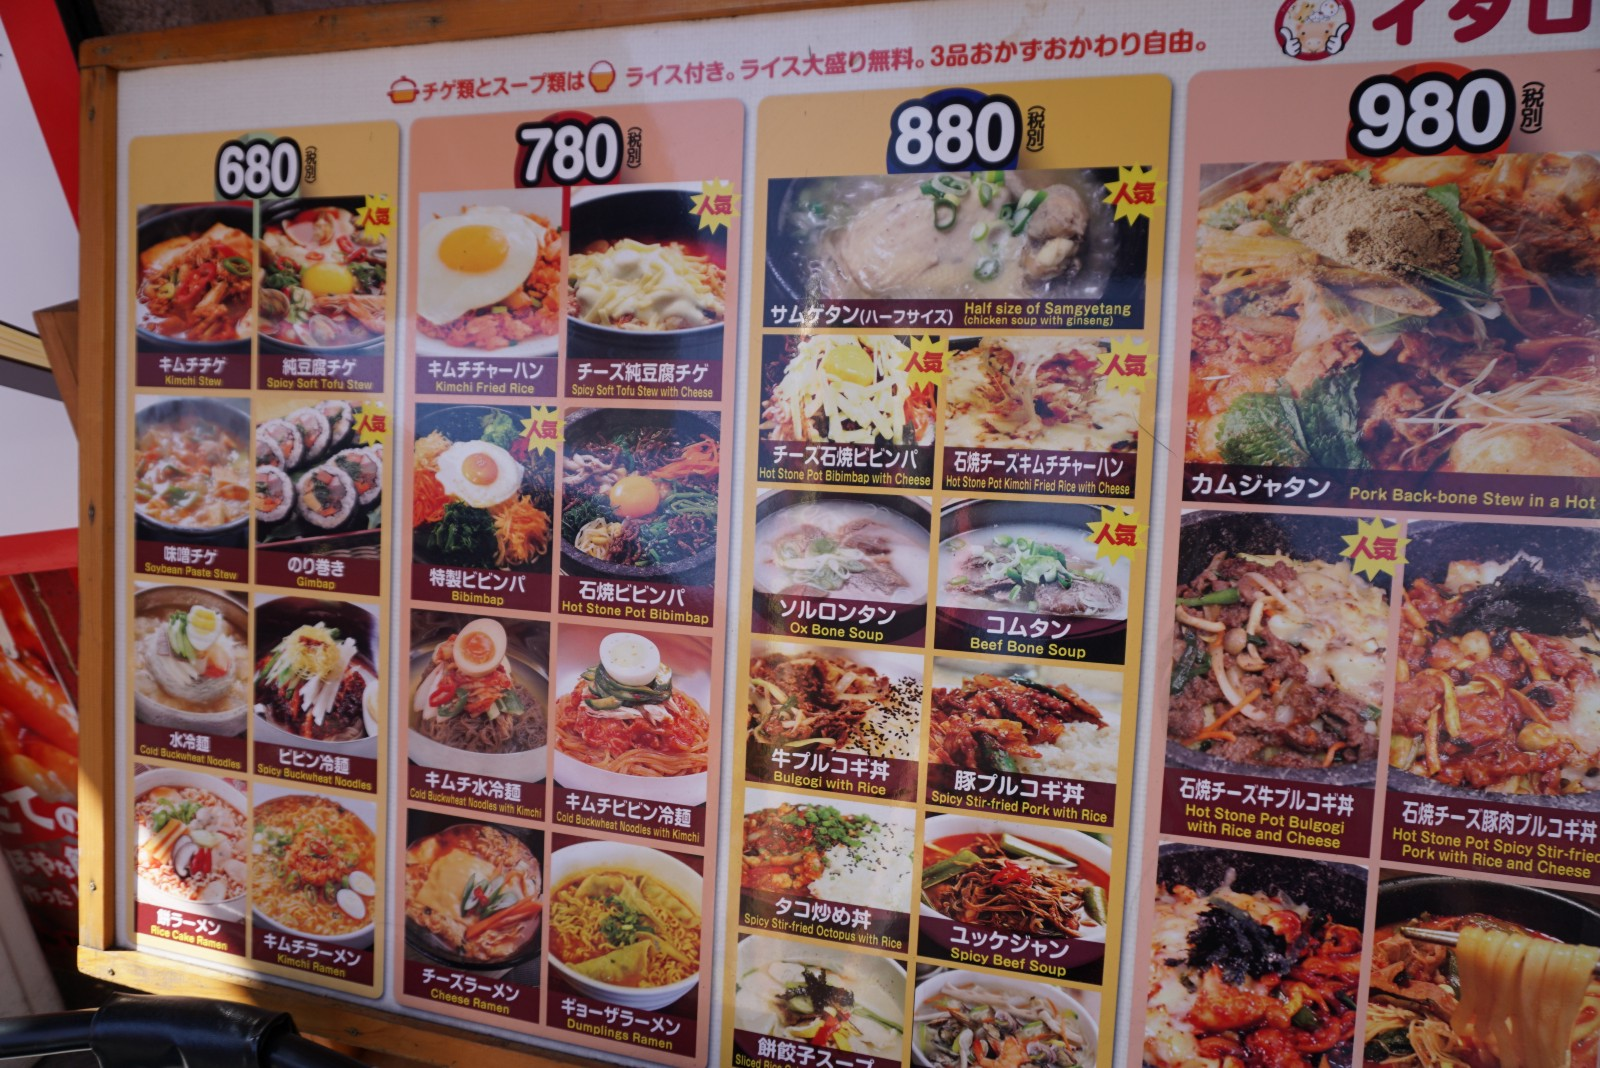 Shin Okubo: Korean Town in Tokyo - Japan Web Magazine